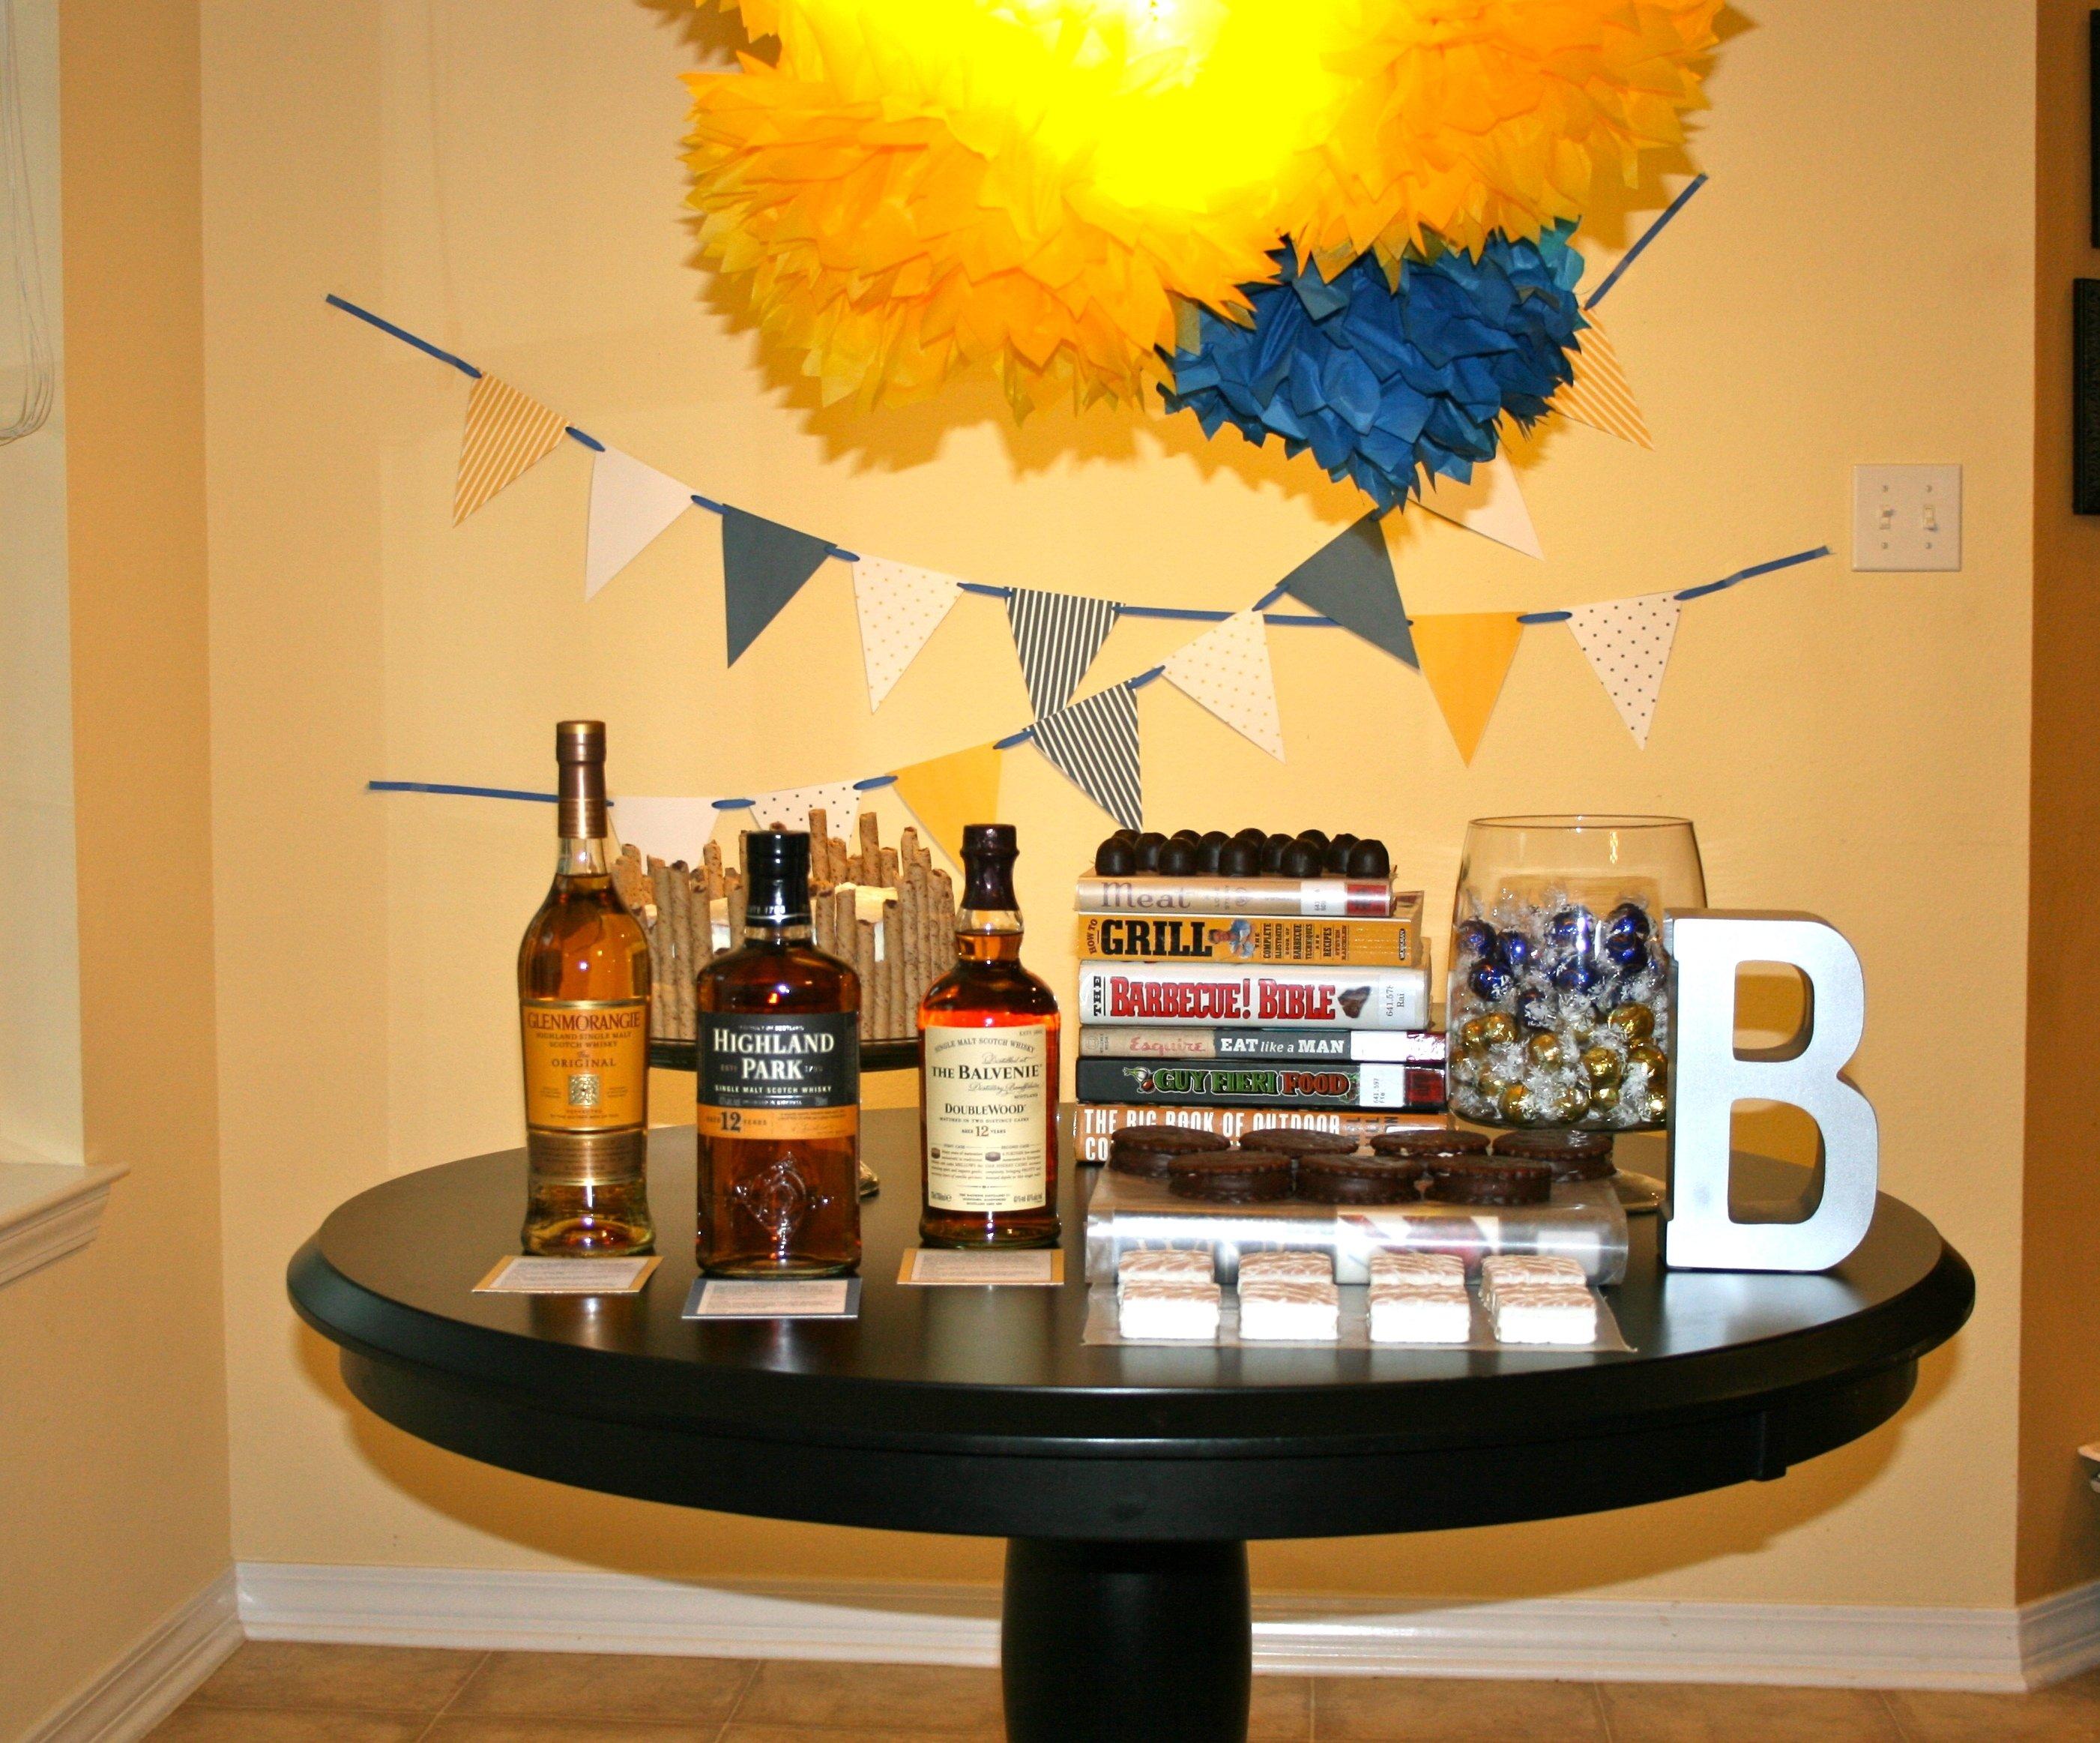 10 Stylish Birthday Party Ideas For Husband scotch birthday party a party studio 2020